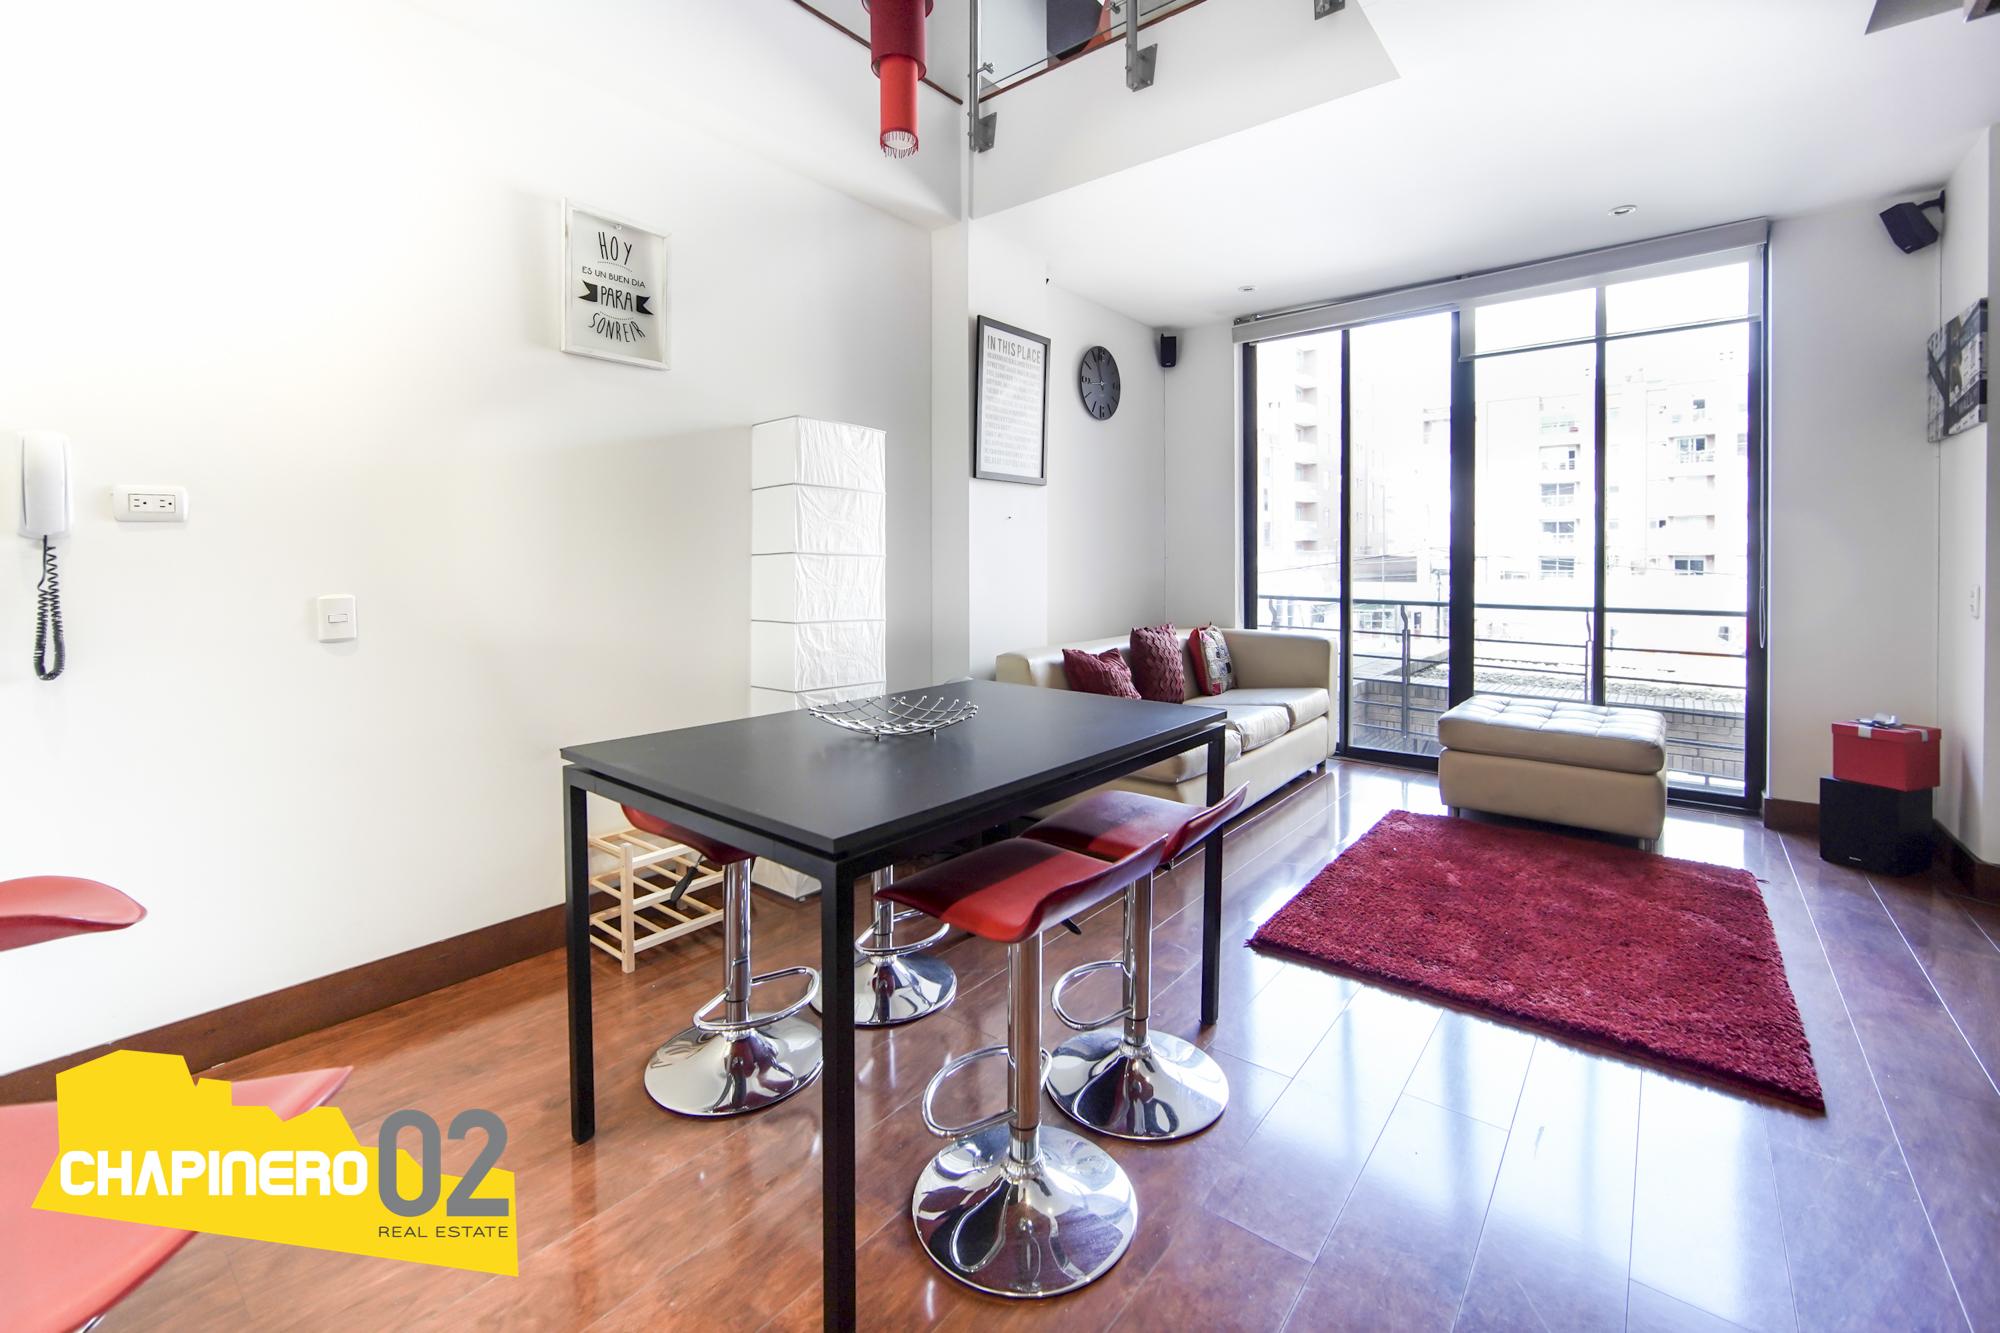 Apto Venta :: 76 m² :: Chicó Norte 3 :: $550M